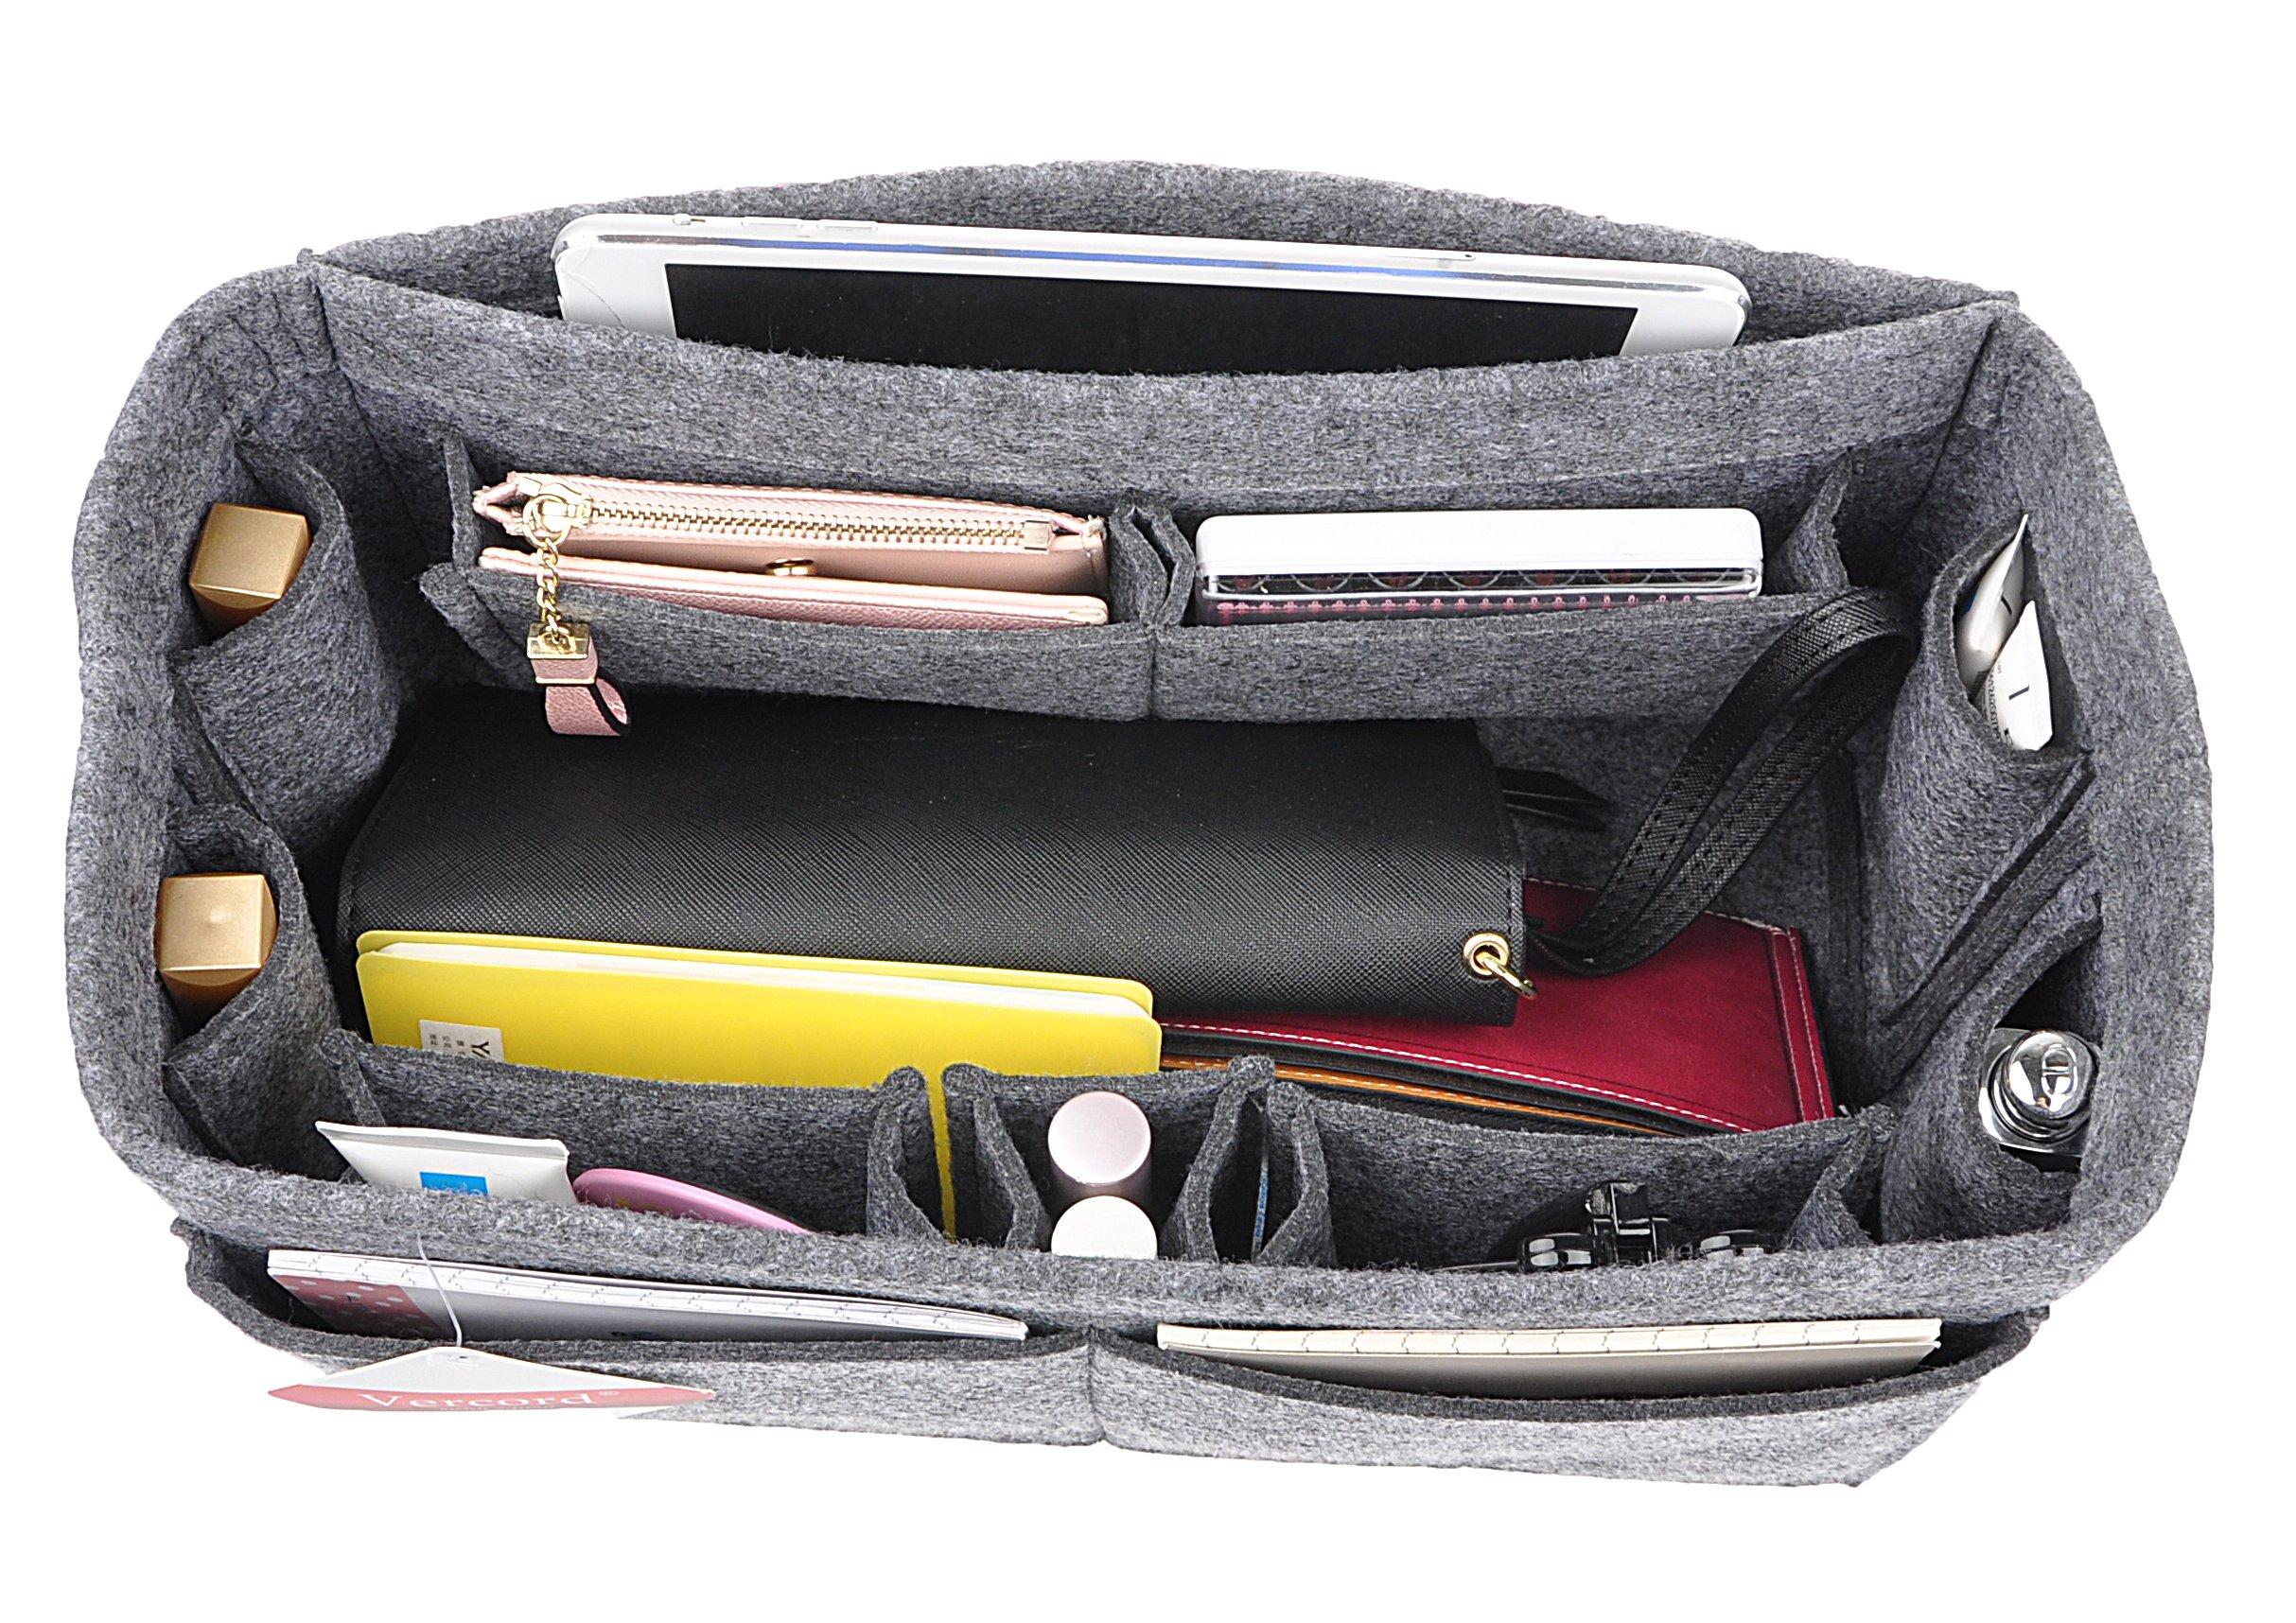 12-Pocket Felt Purse Organizer, Bag Handbag Organizer Insert For Women, Bag in Bag, Speedy 30 and Speedy 35 Grey L